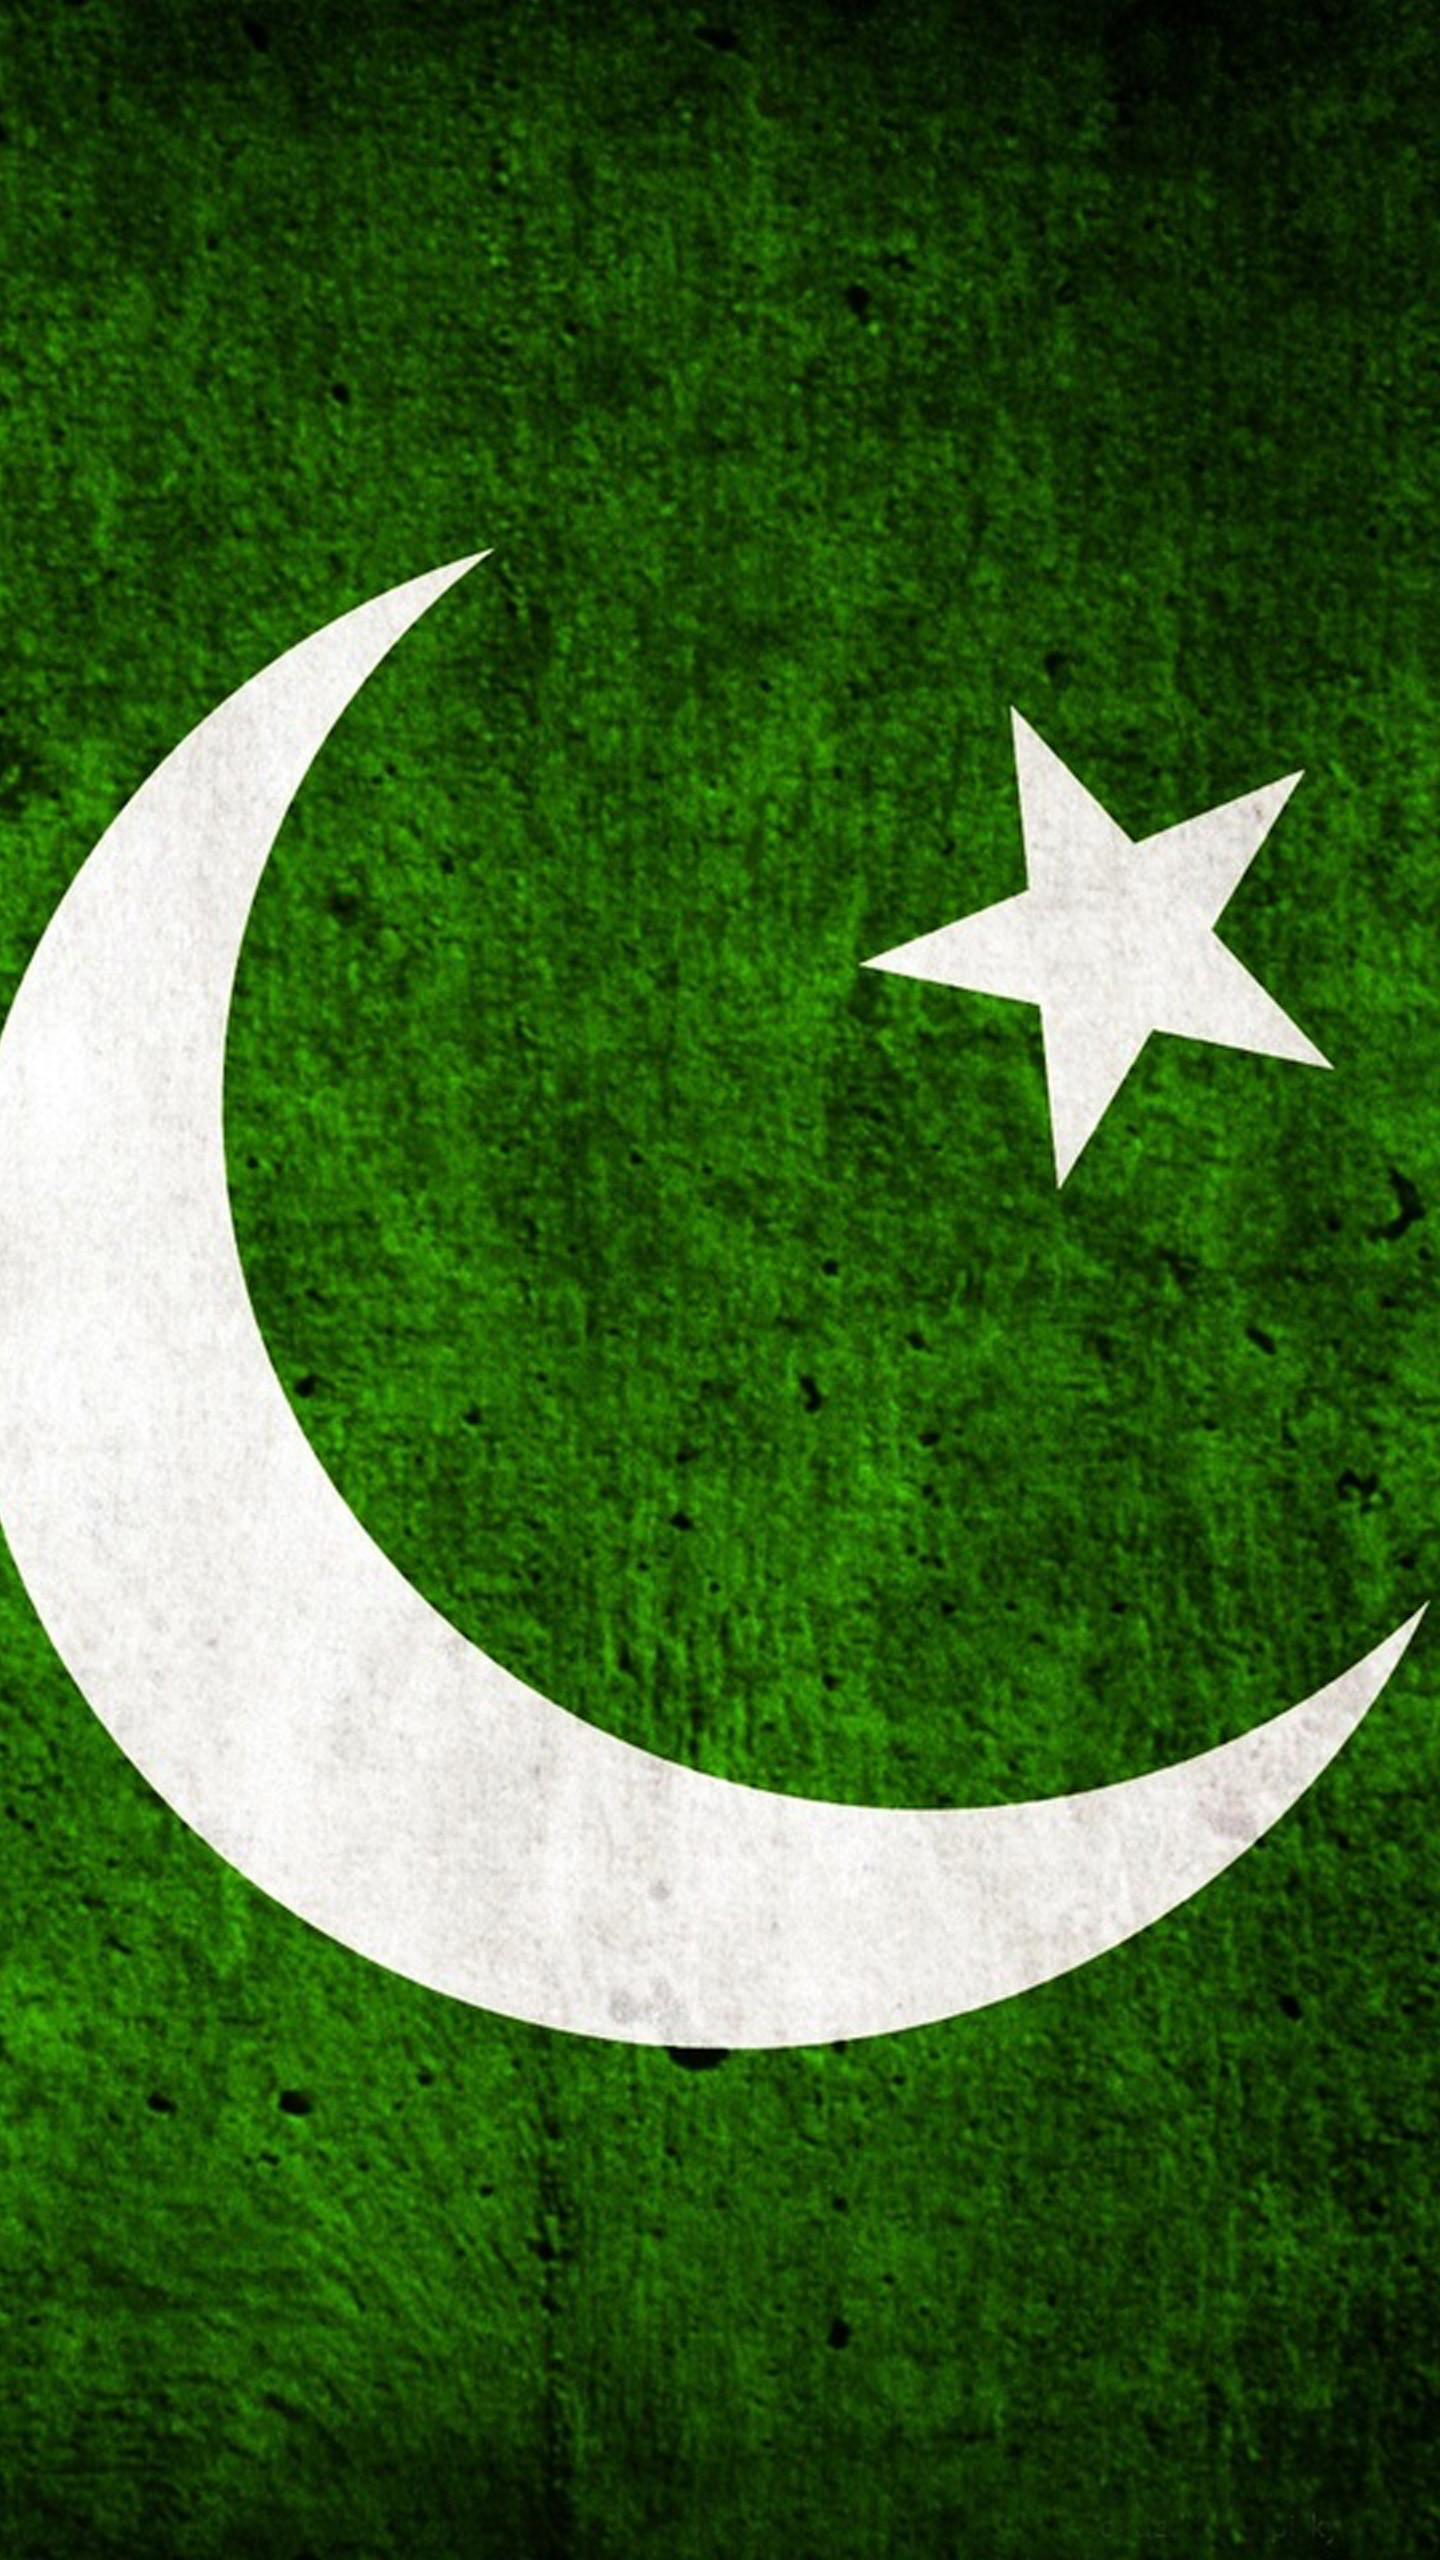 Pakistan Flag Wallpapers Hd 2018 ①